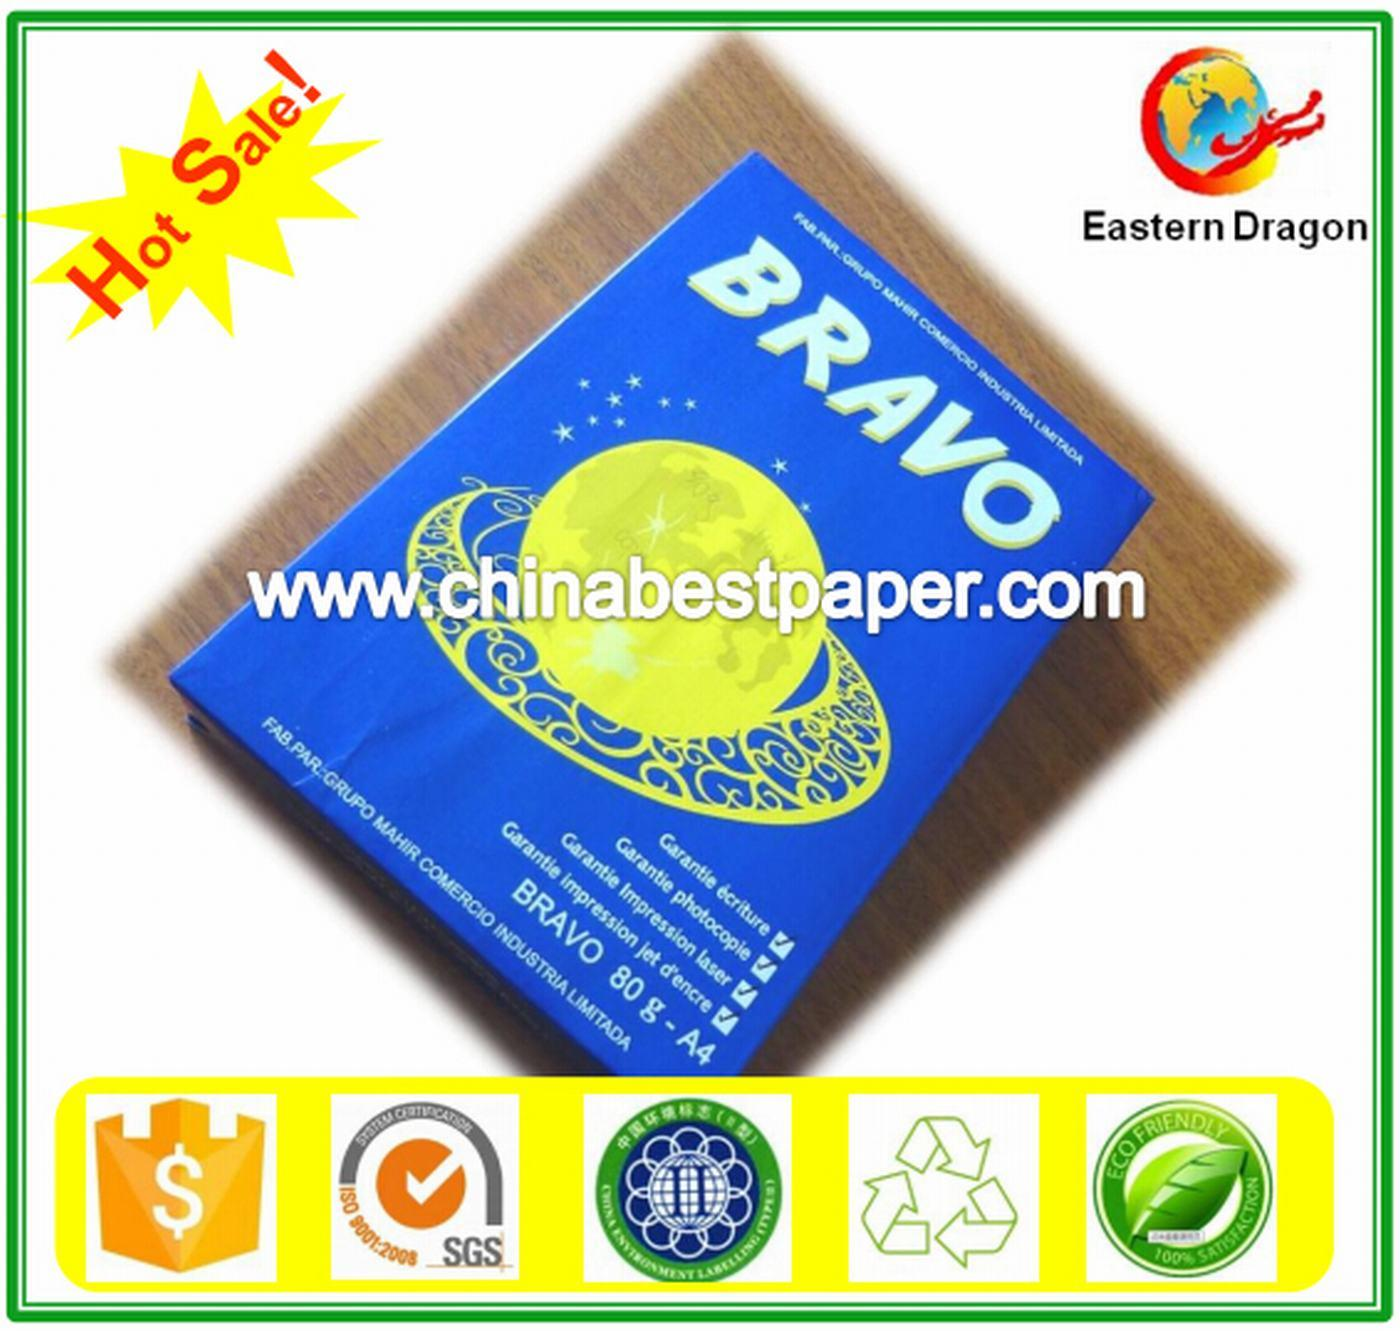 75G A4 White Bravo Copy Paper